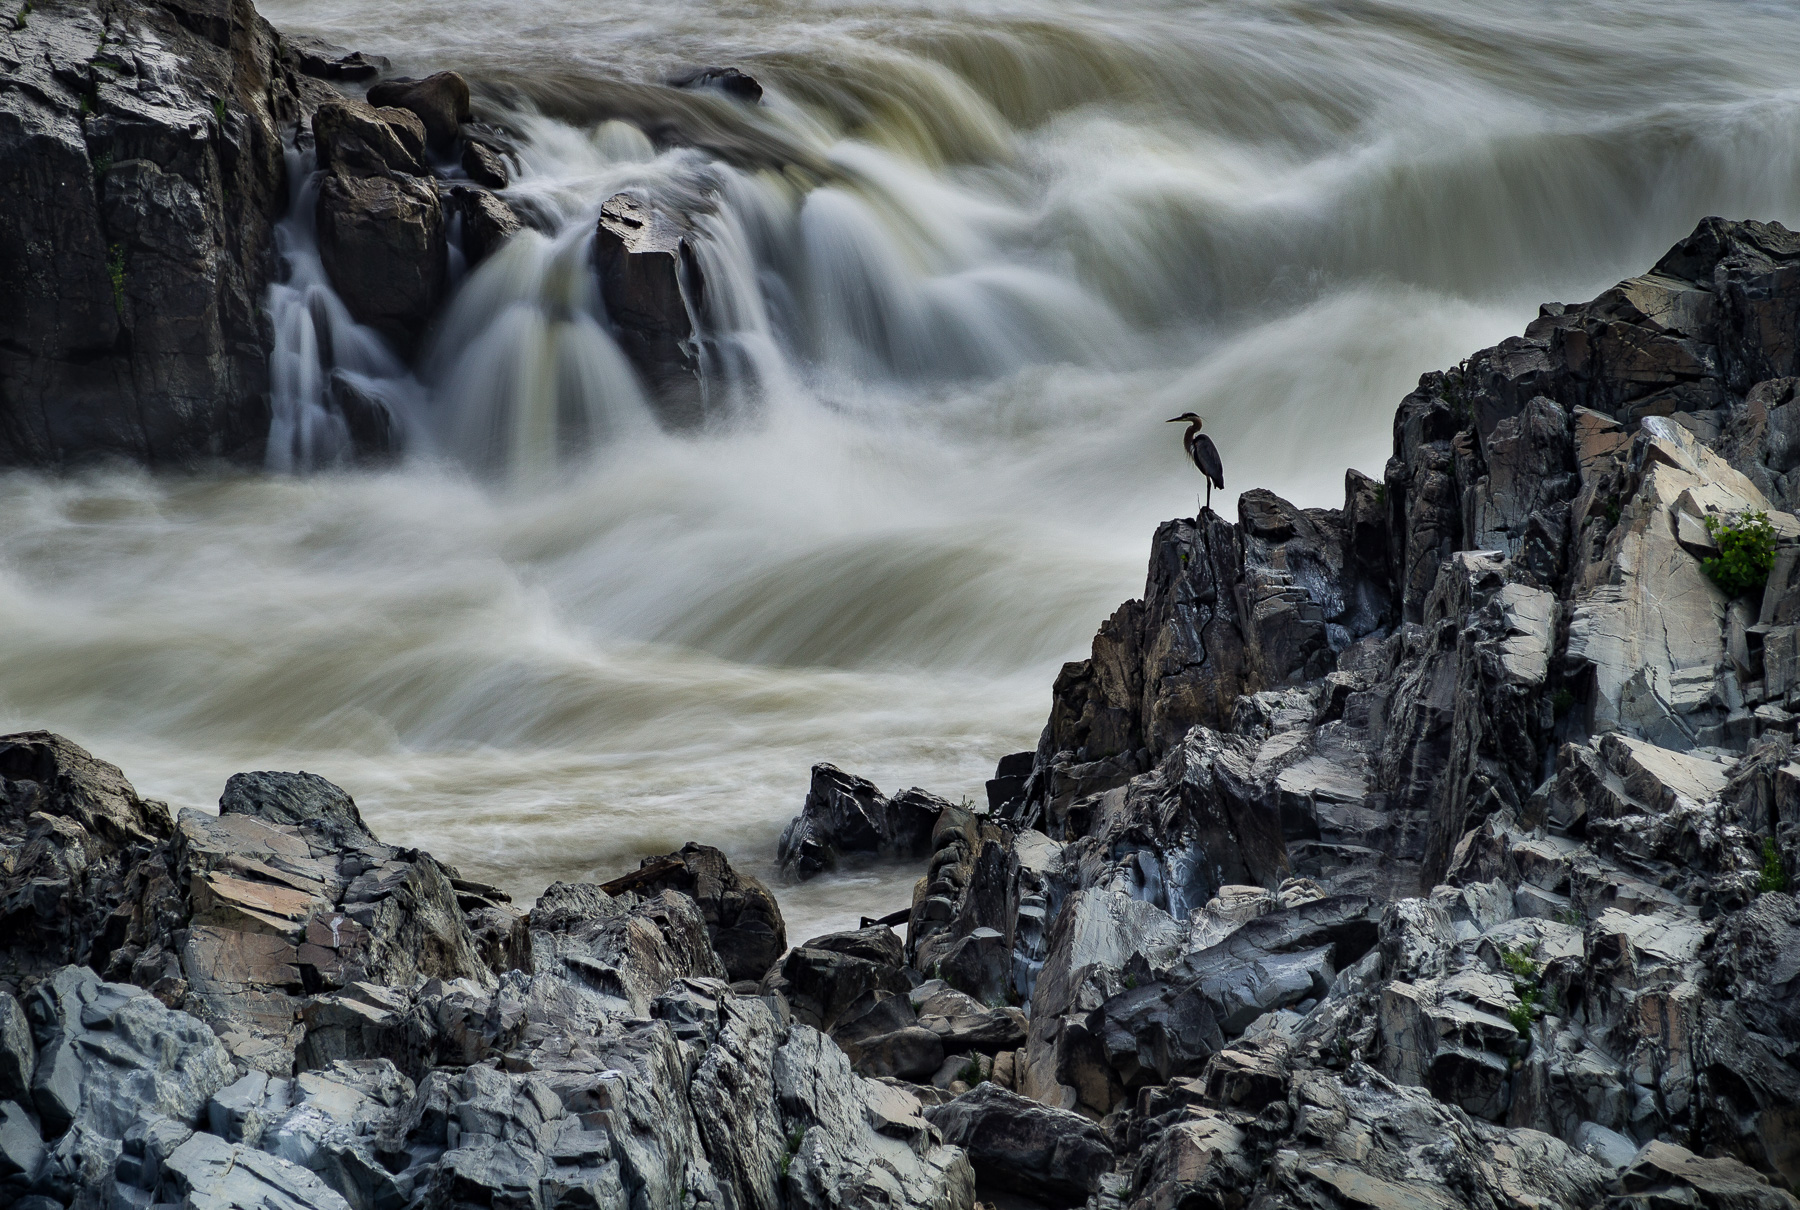 Heron on the Rocks